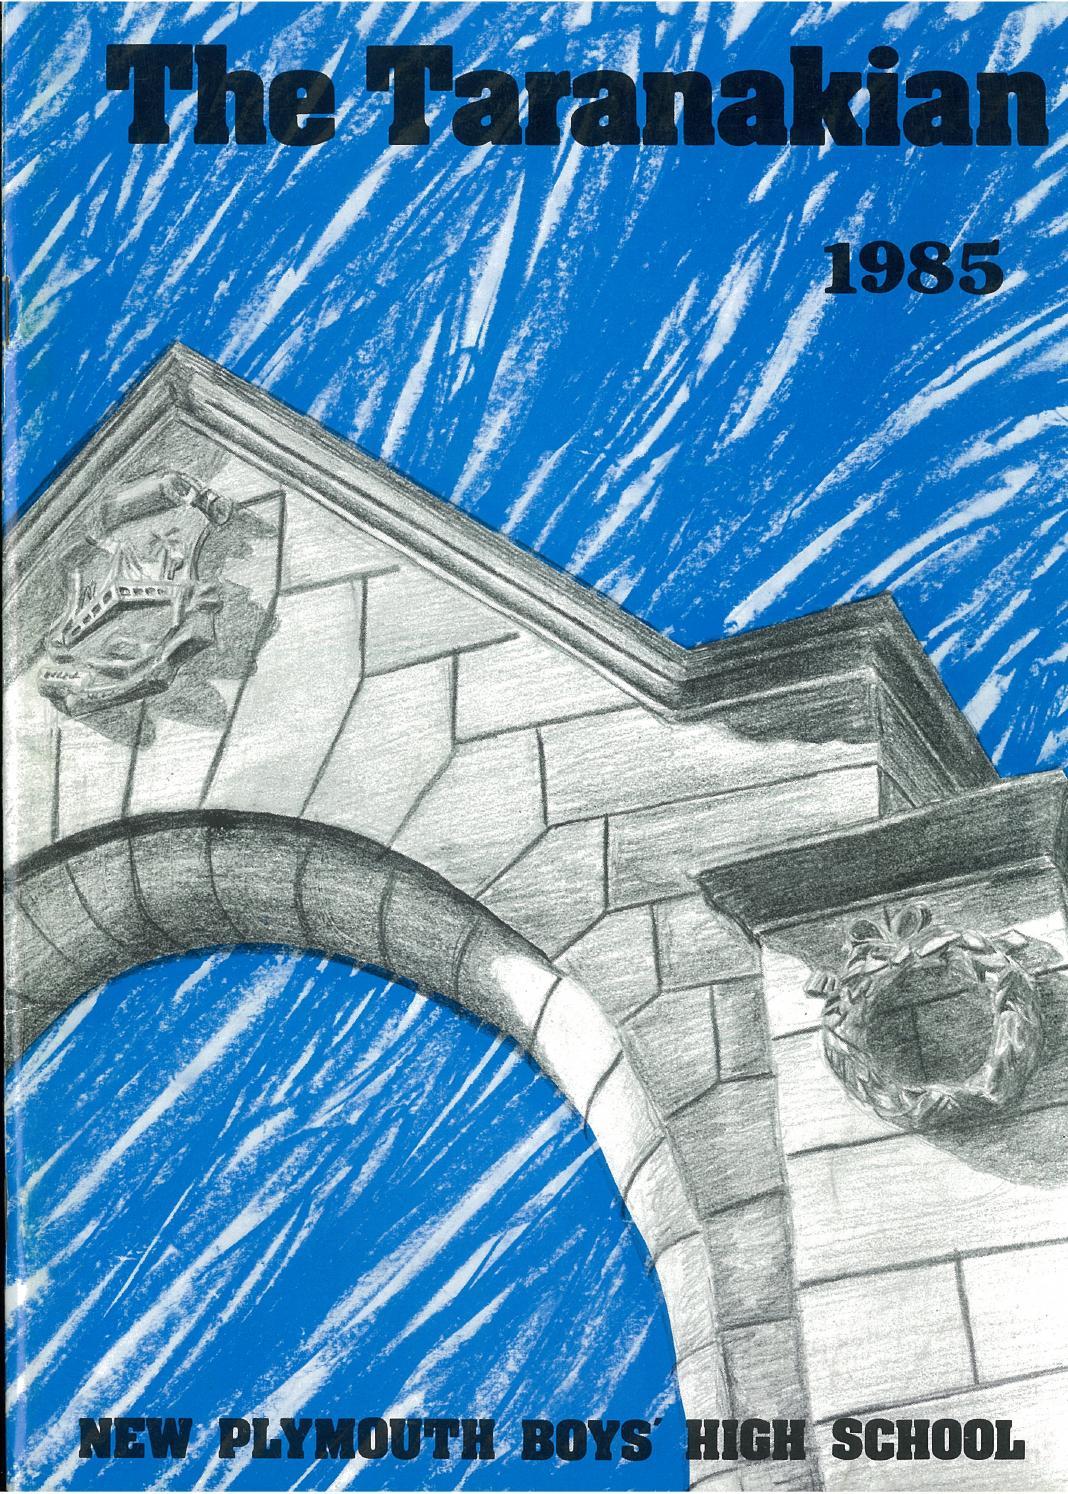 1985 The Taranakian Vol 74 No 1 By New Plymouth Boys High School Issuu